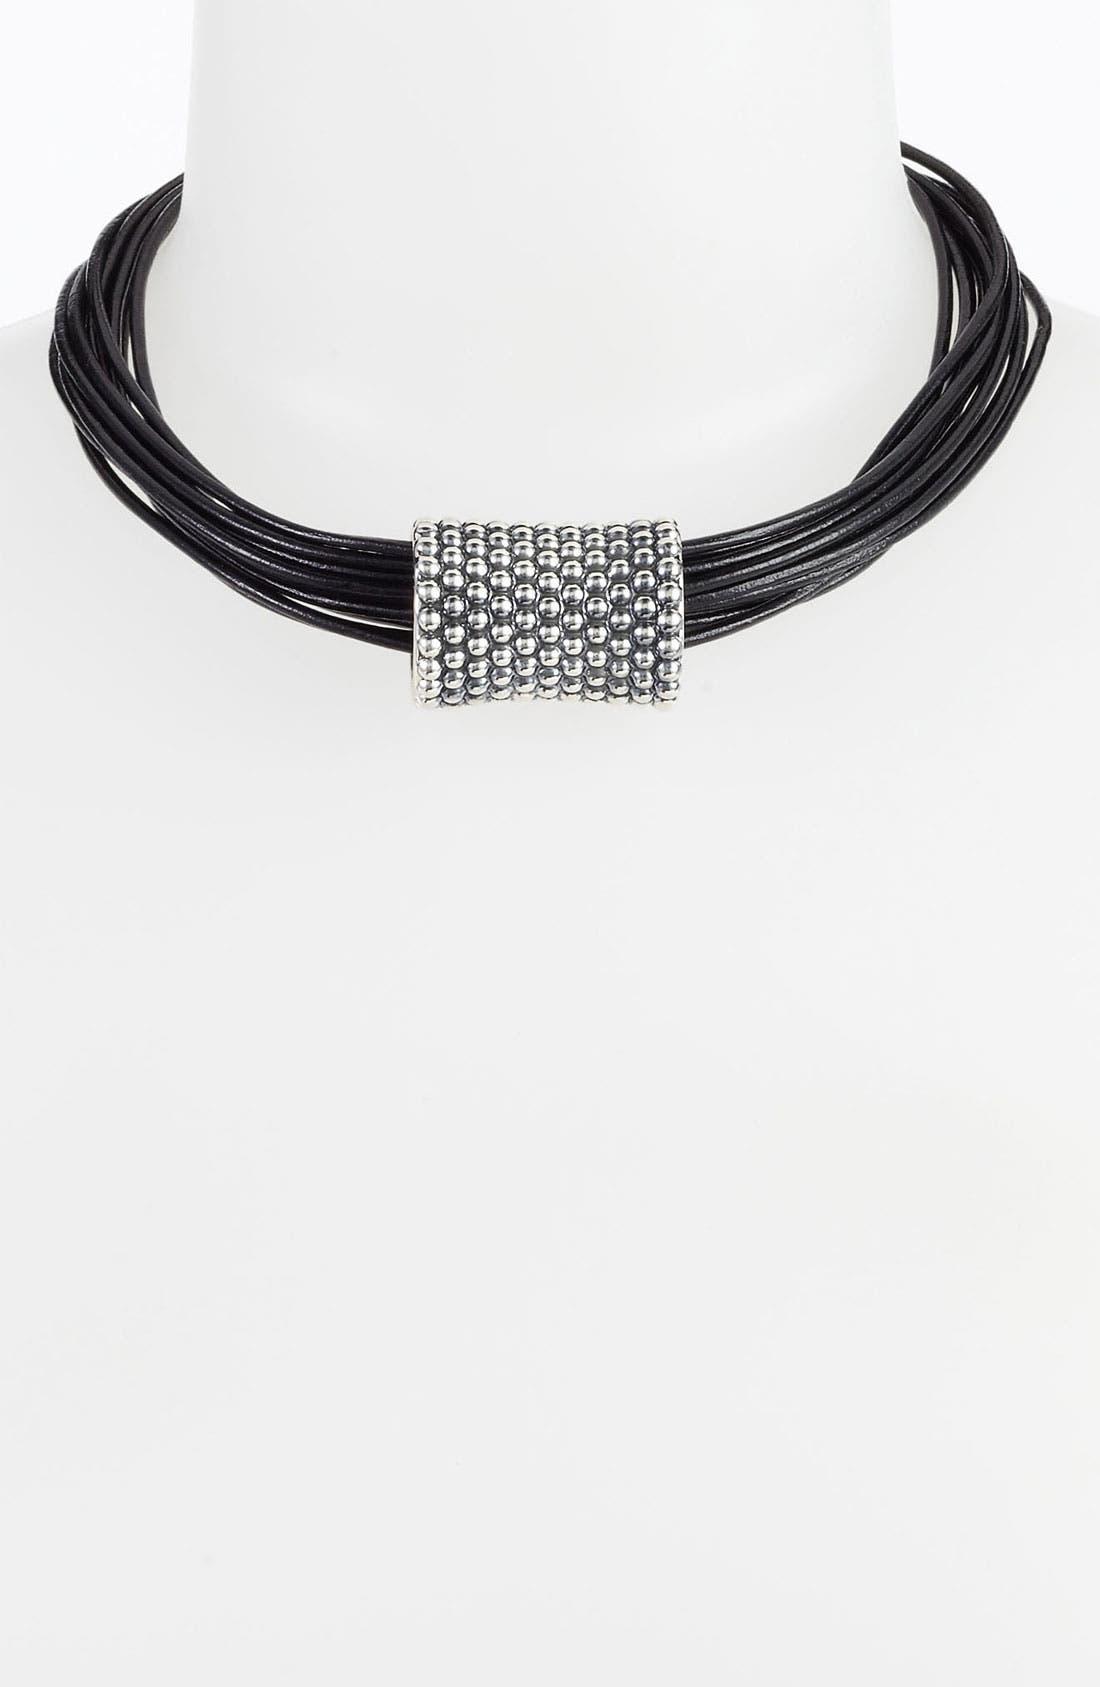 Main Image - Simon Sebbag 'Prosecco' Multistrand Leather Necklace